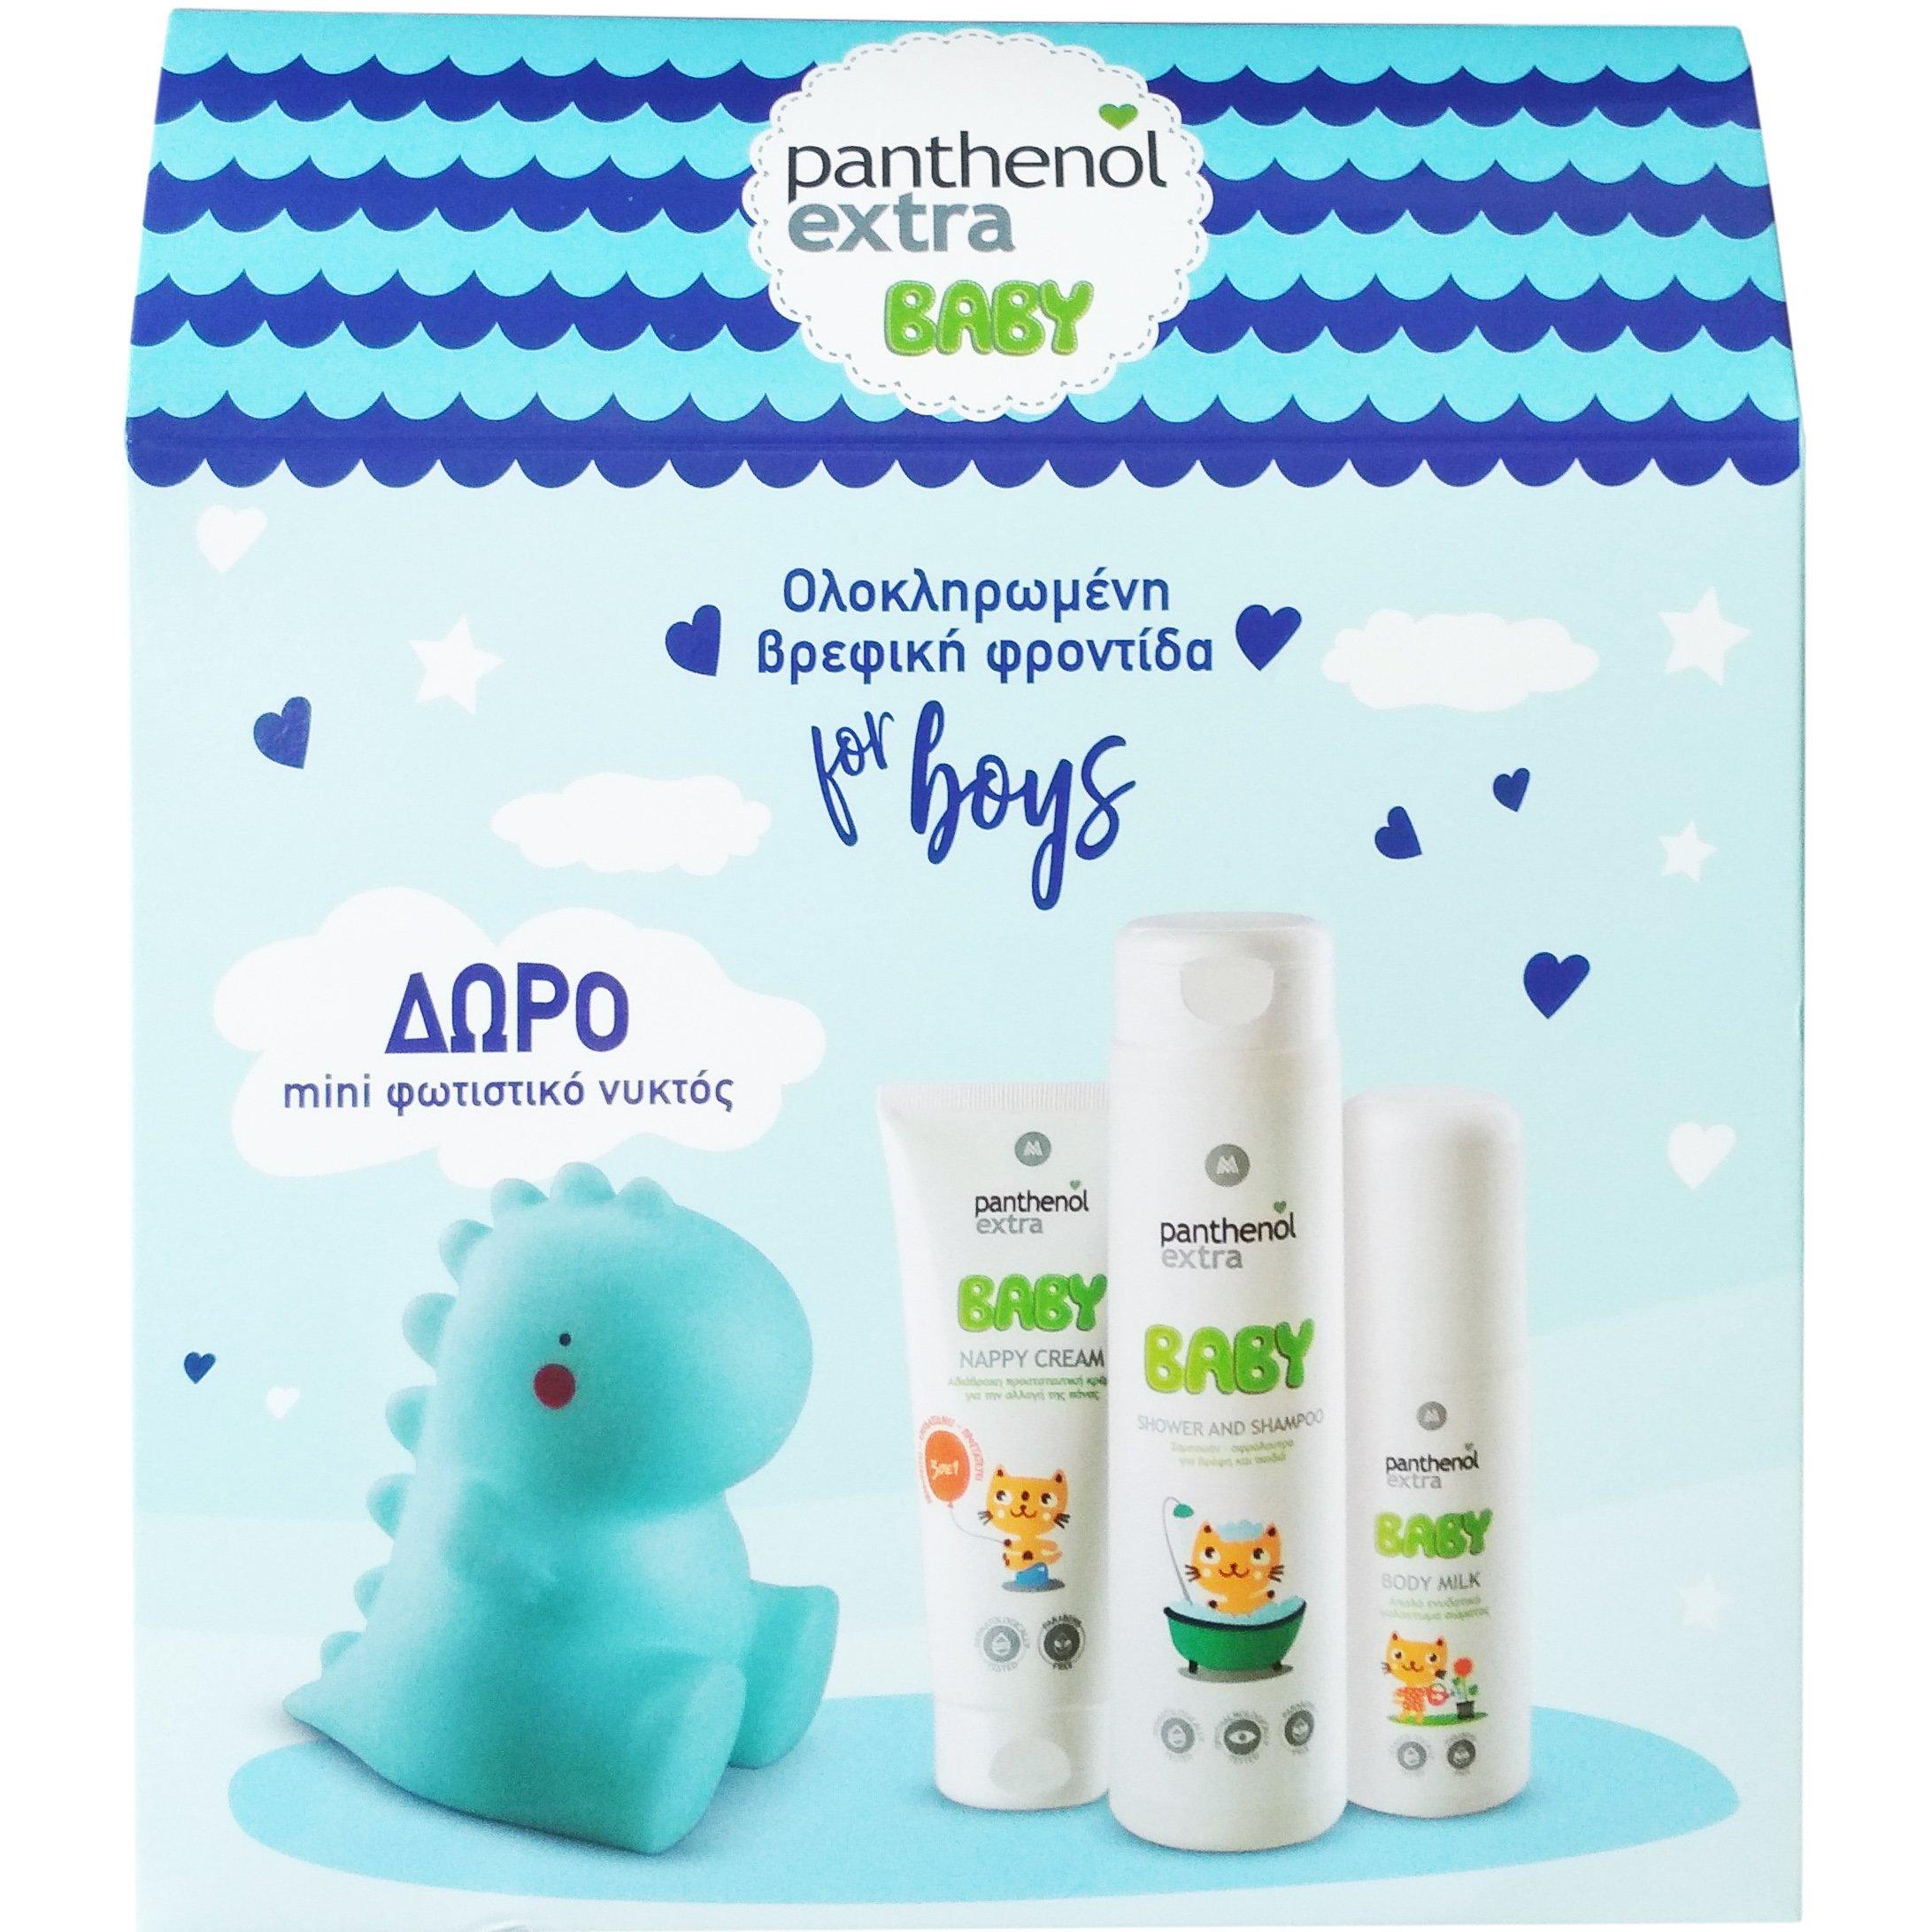 Medisei Panthenol Extra Baby Kit For Boys Ολοκληρωμένη Βρεφική Φροντίδα για Αγόρια & Δώρο Mini Φωτιστικό Νυκτός